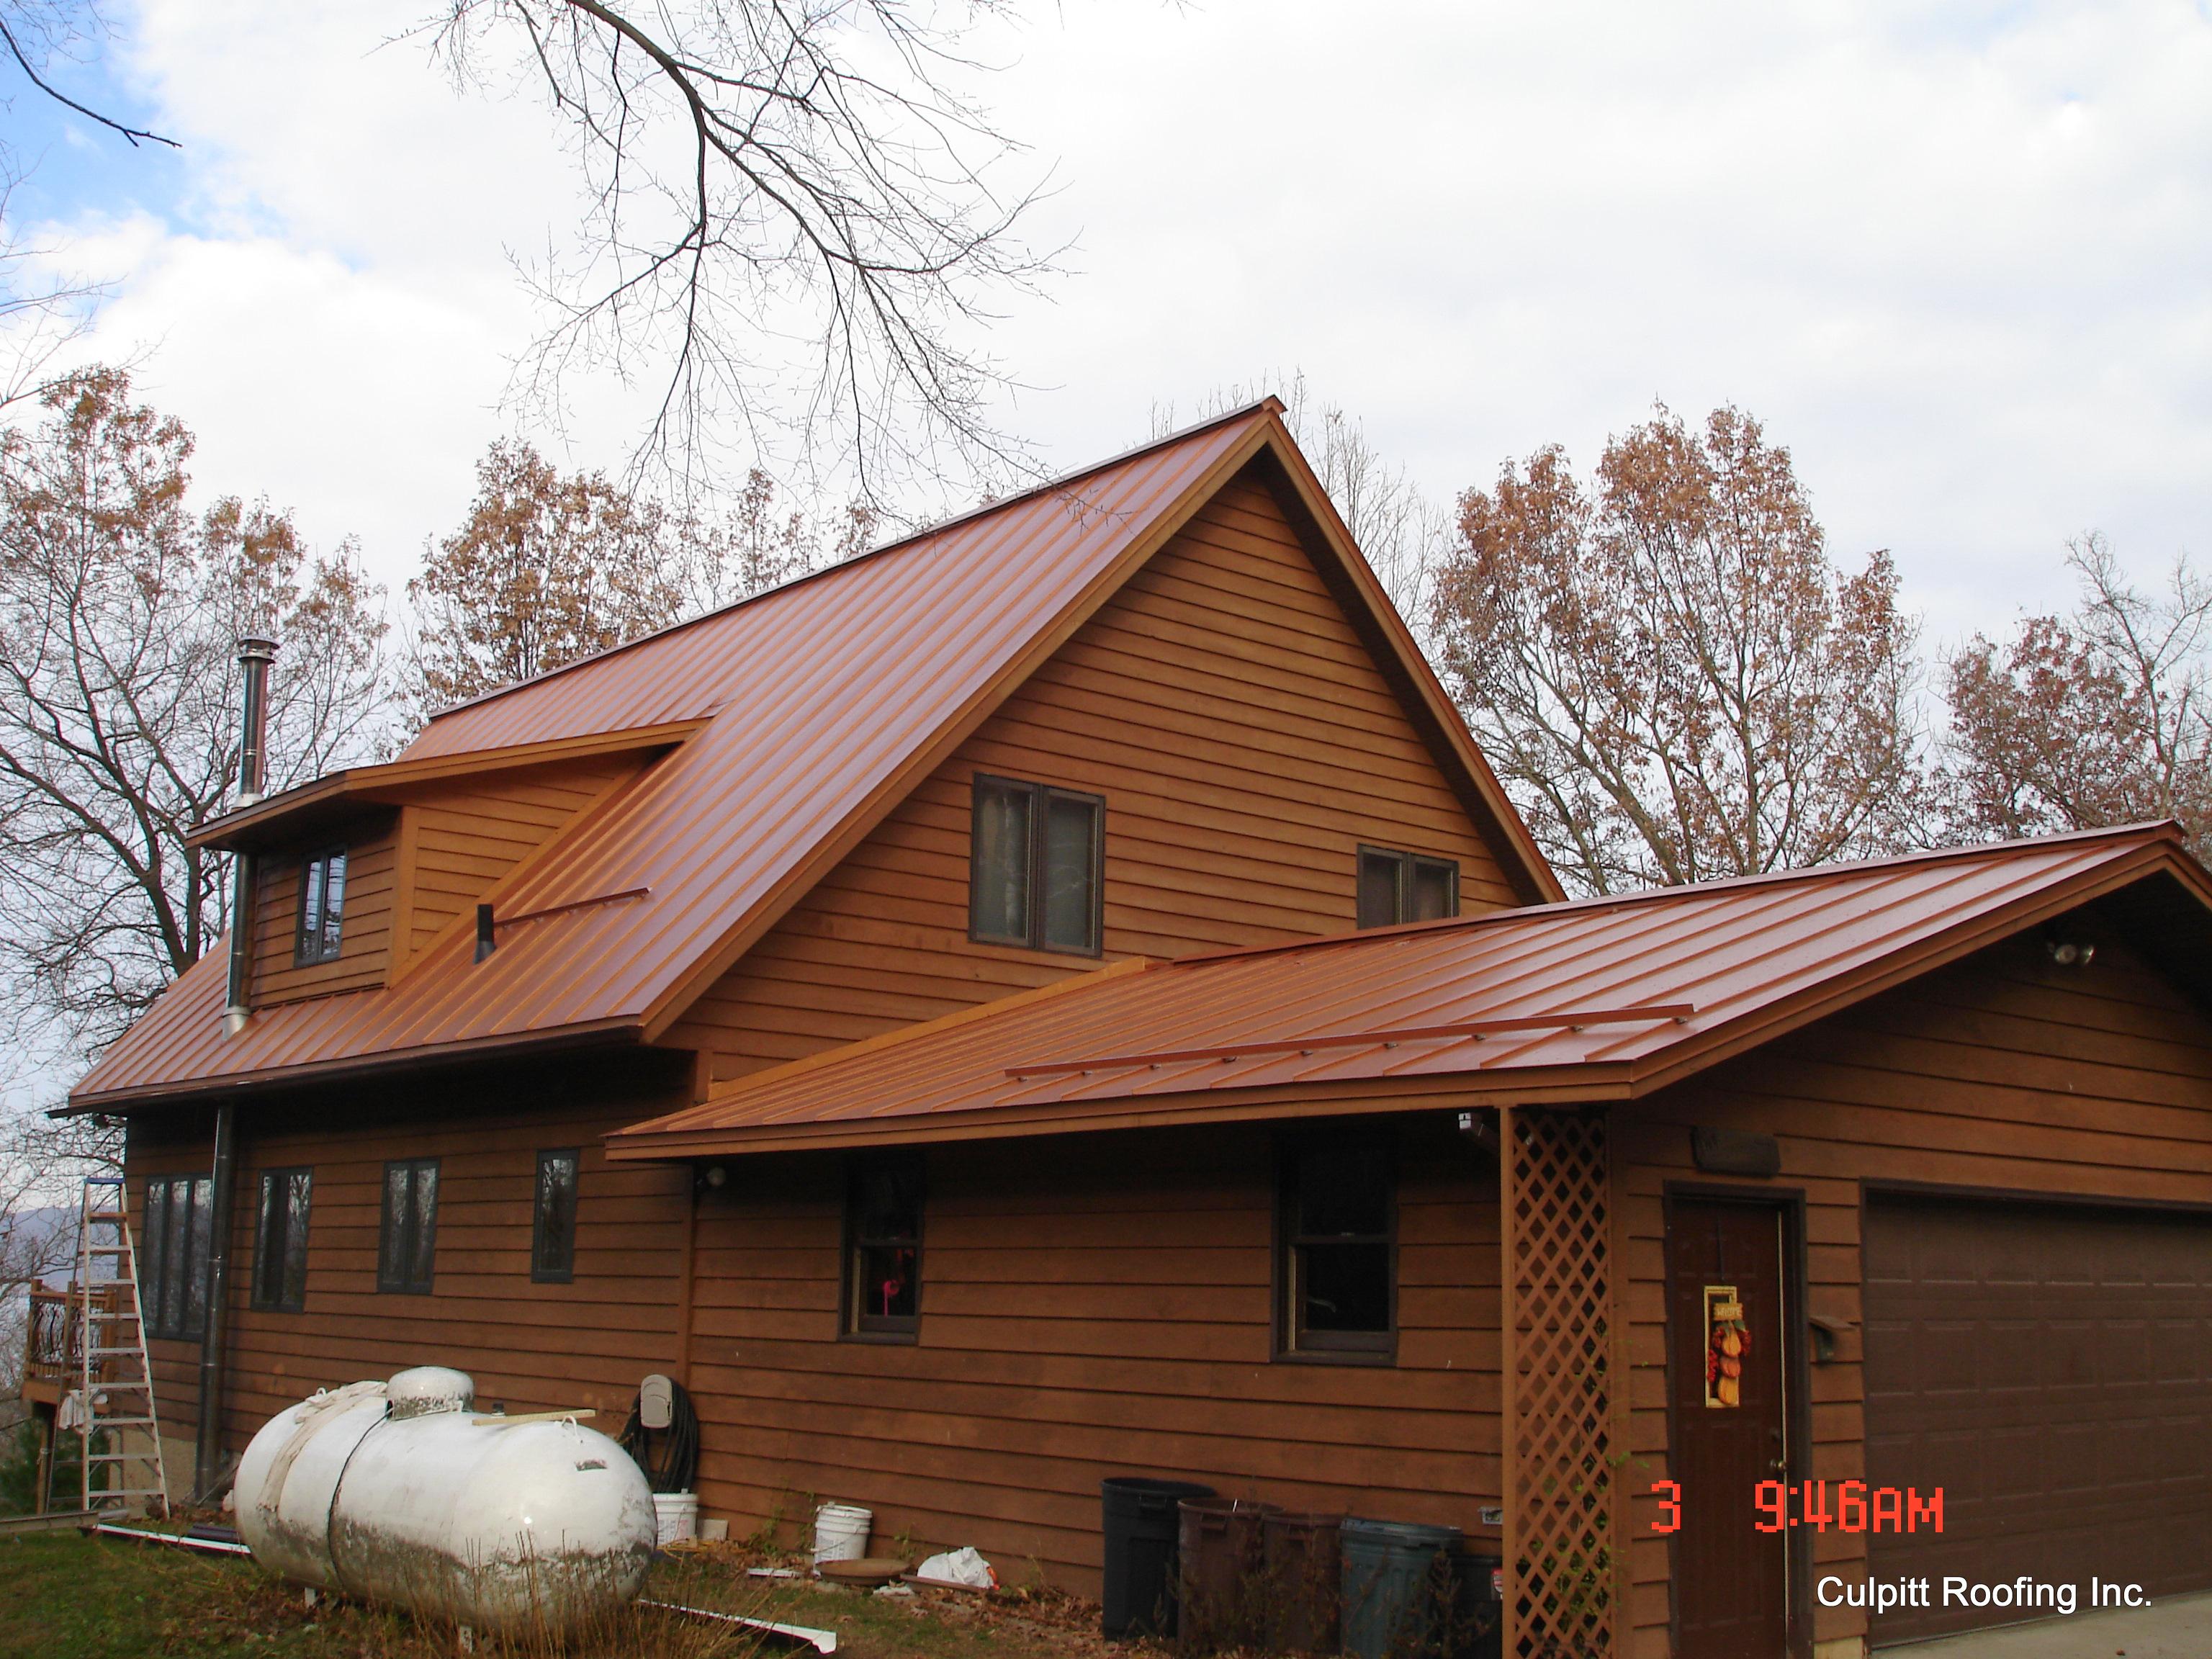 sheet Metal roofing standing seam snow rail copper residential house wisconsin iowa illinois minnesota north dakota